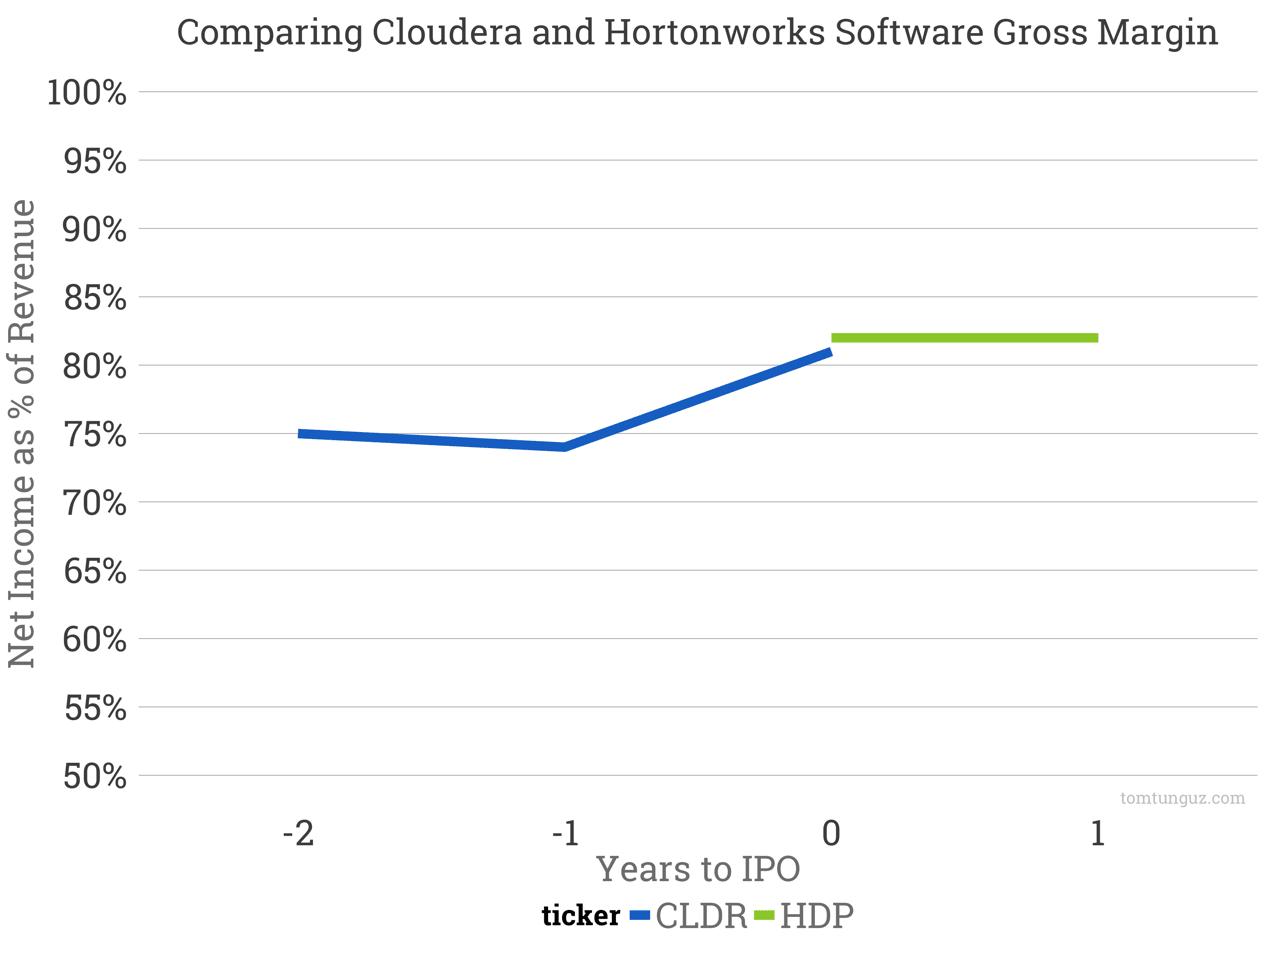 Benchmarking Cloudera's S-1 - How 7 Key SaaS Metrics Stack Up